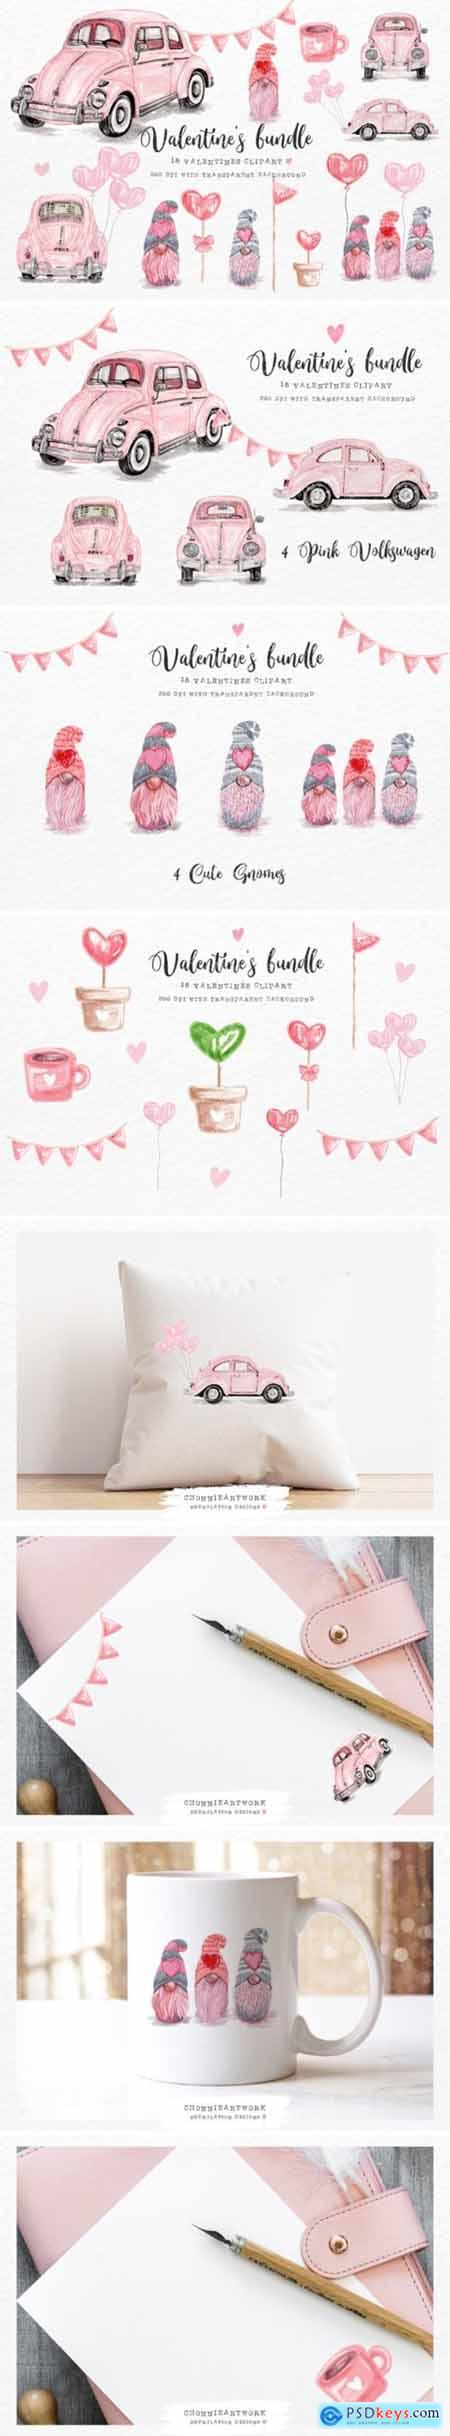 Valentines Day Bundle with Volkswagen 6916987